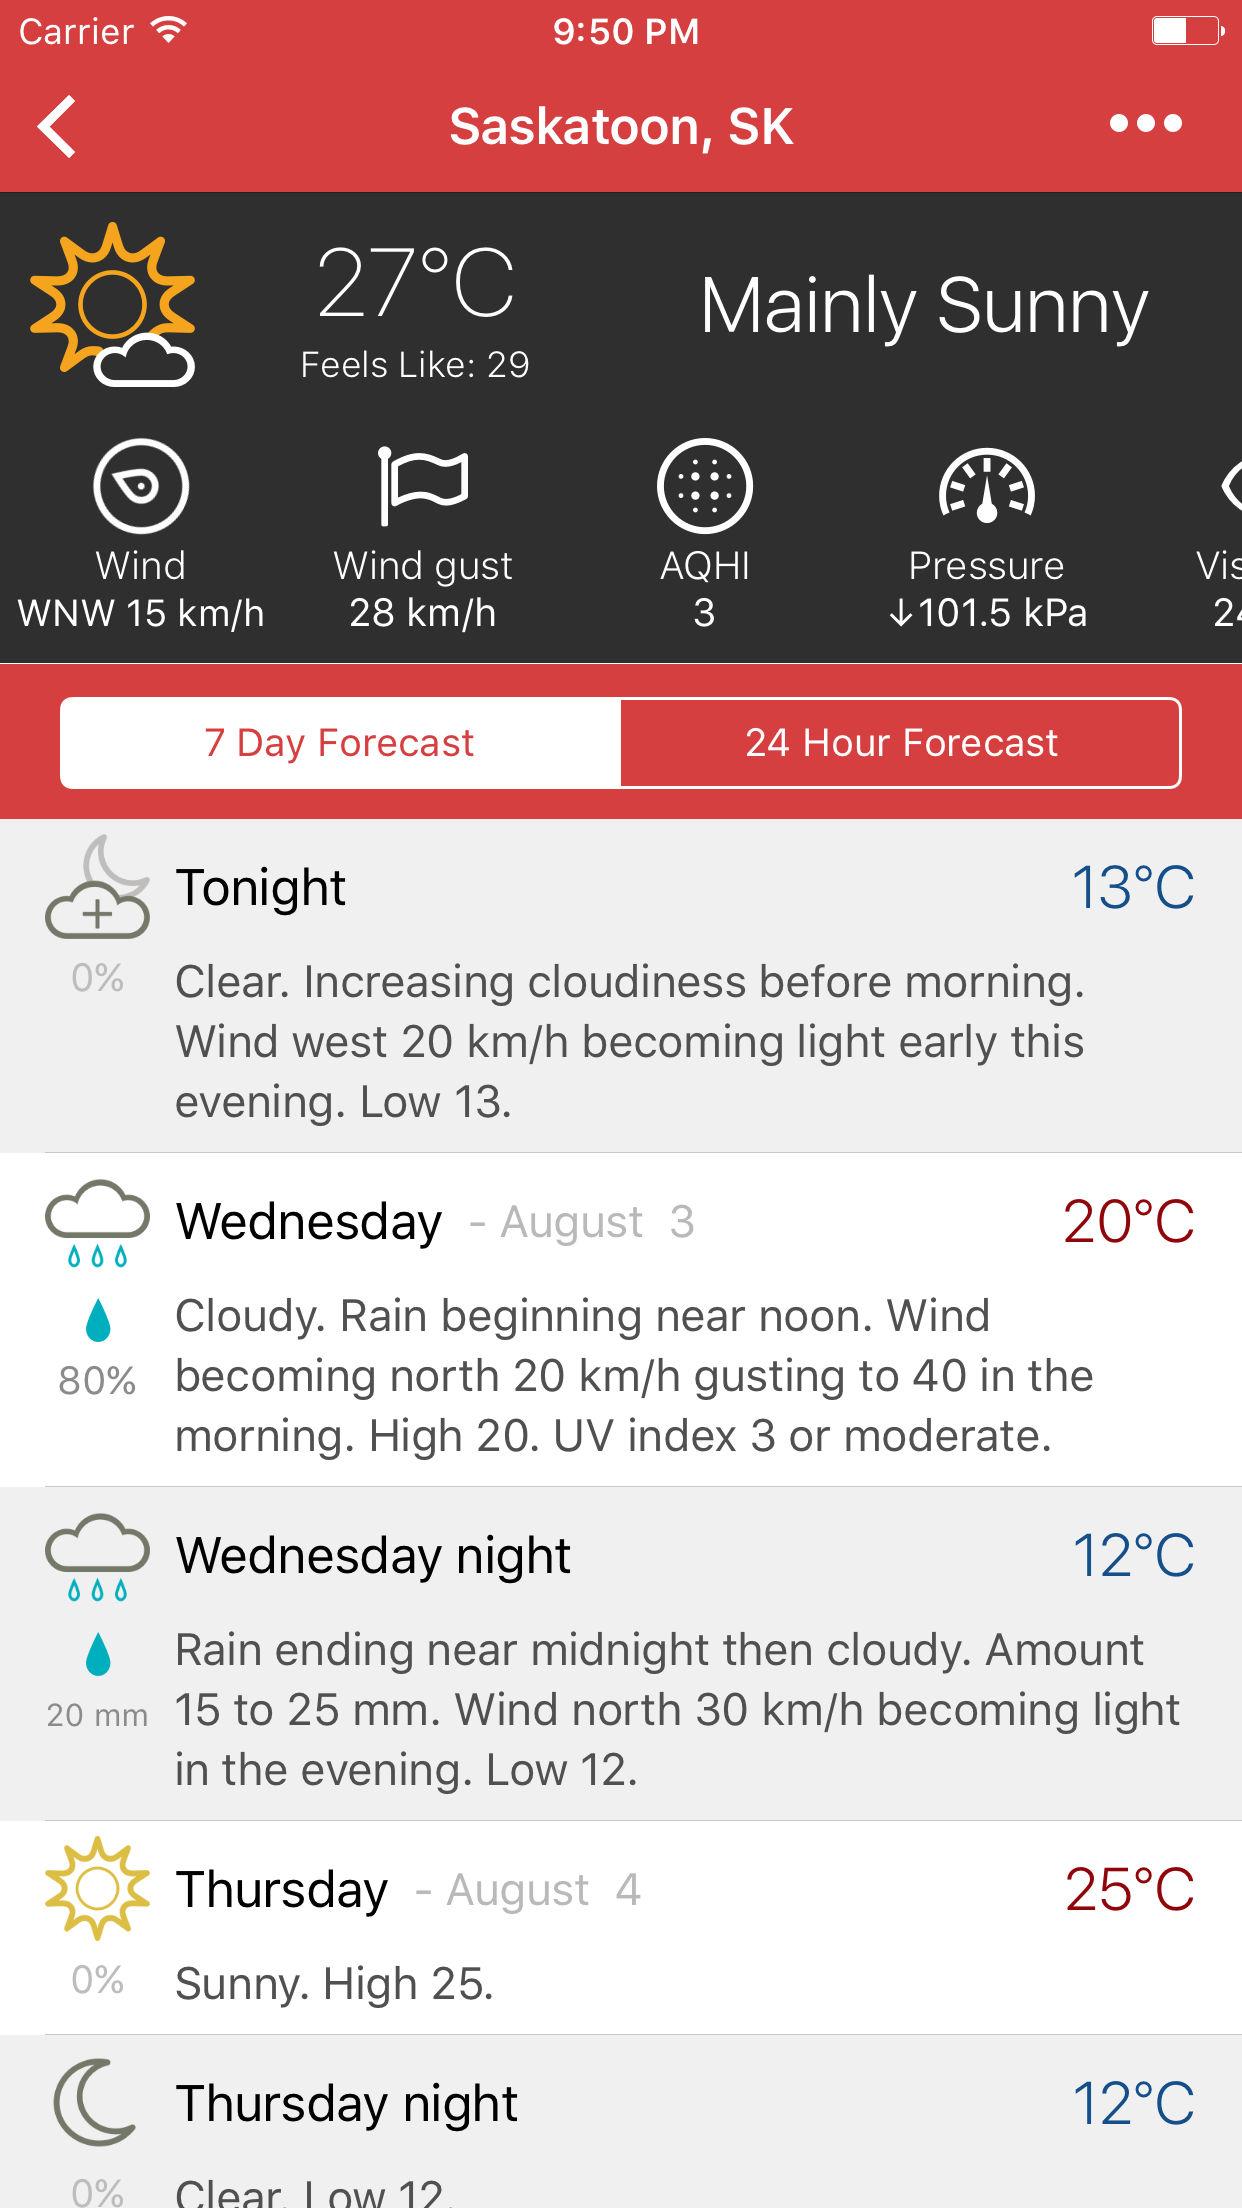 Météo: Canadian Weather | Open Government